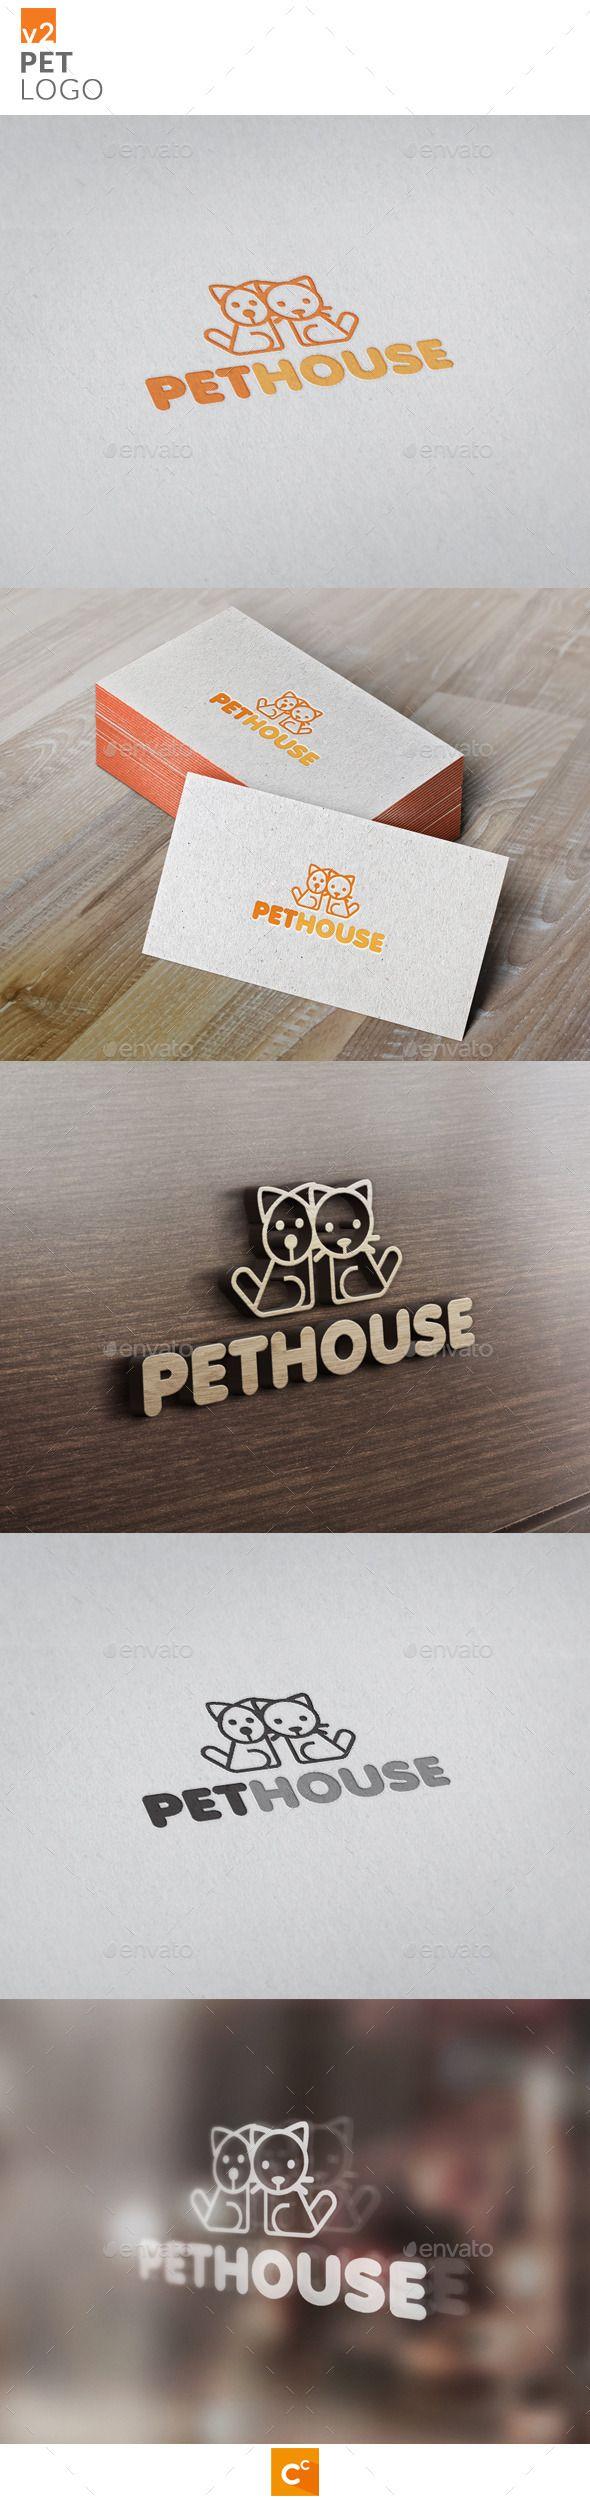 Pets Logo v2 - Animals Logo Templates